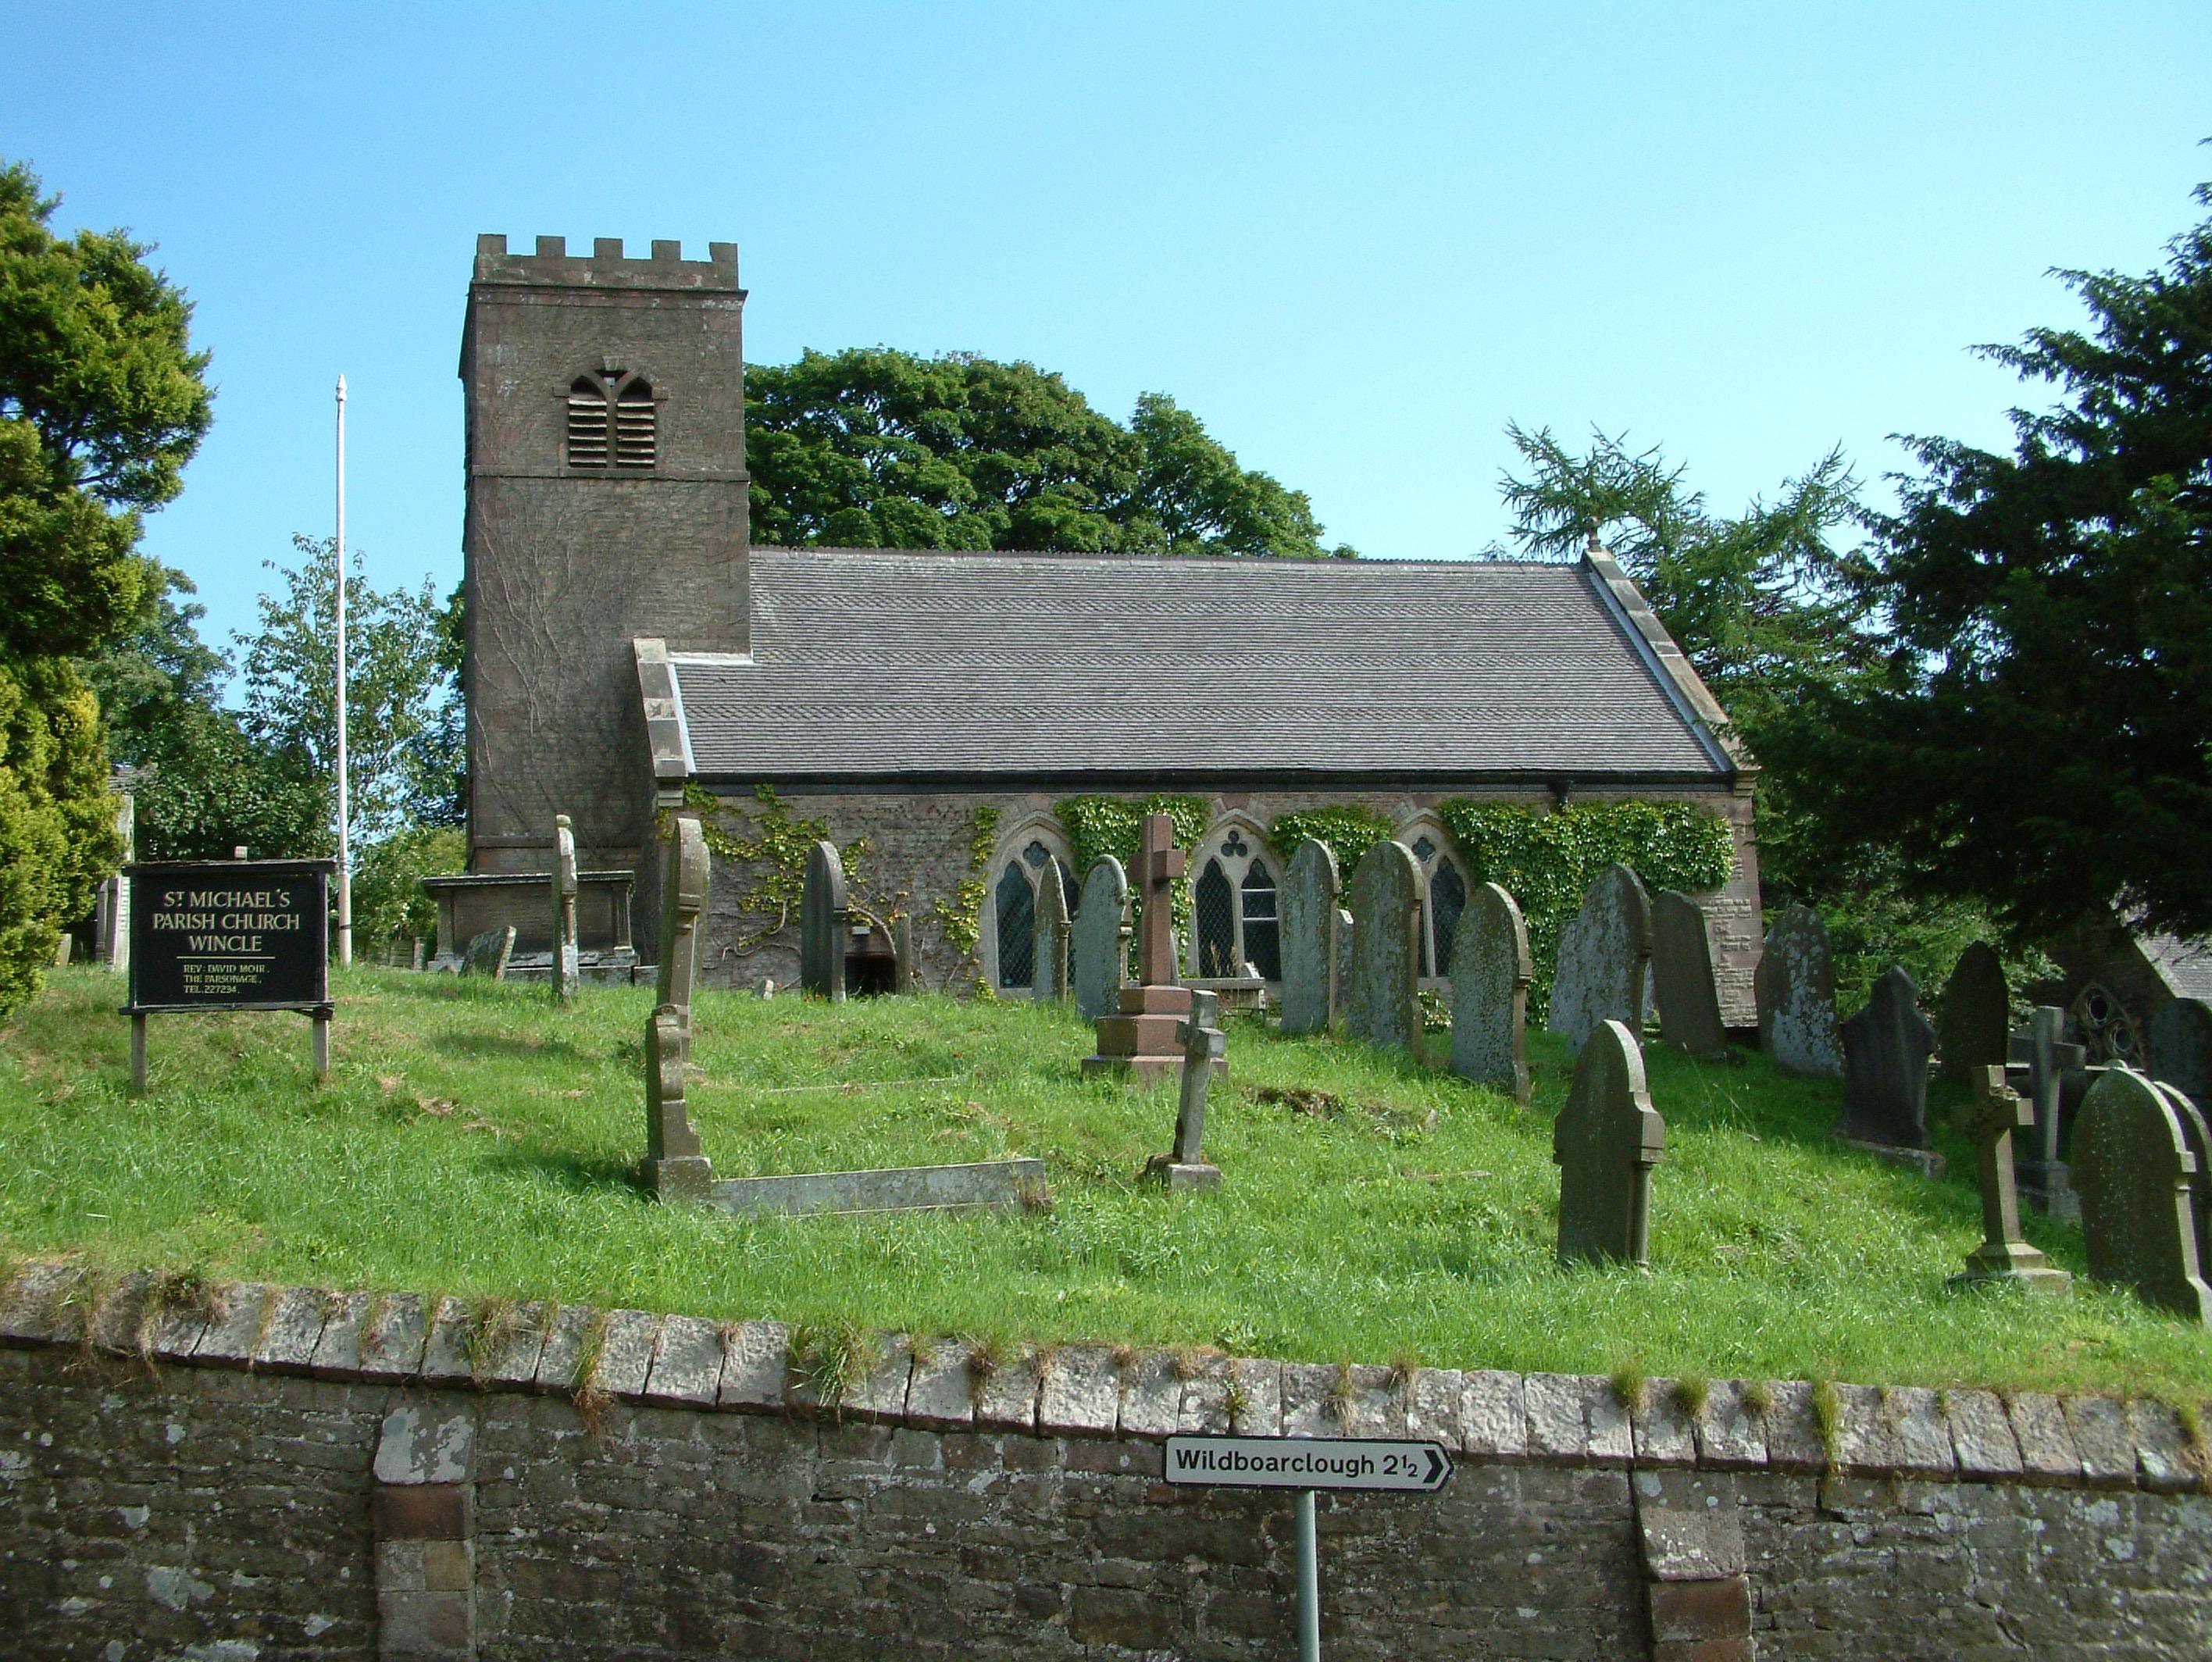 WINCLE, St Michael's